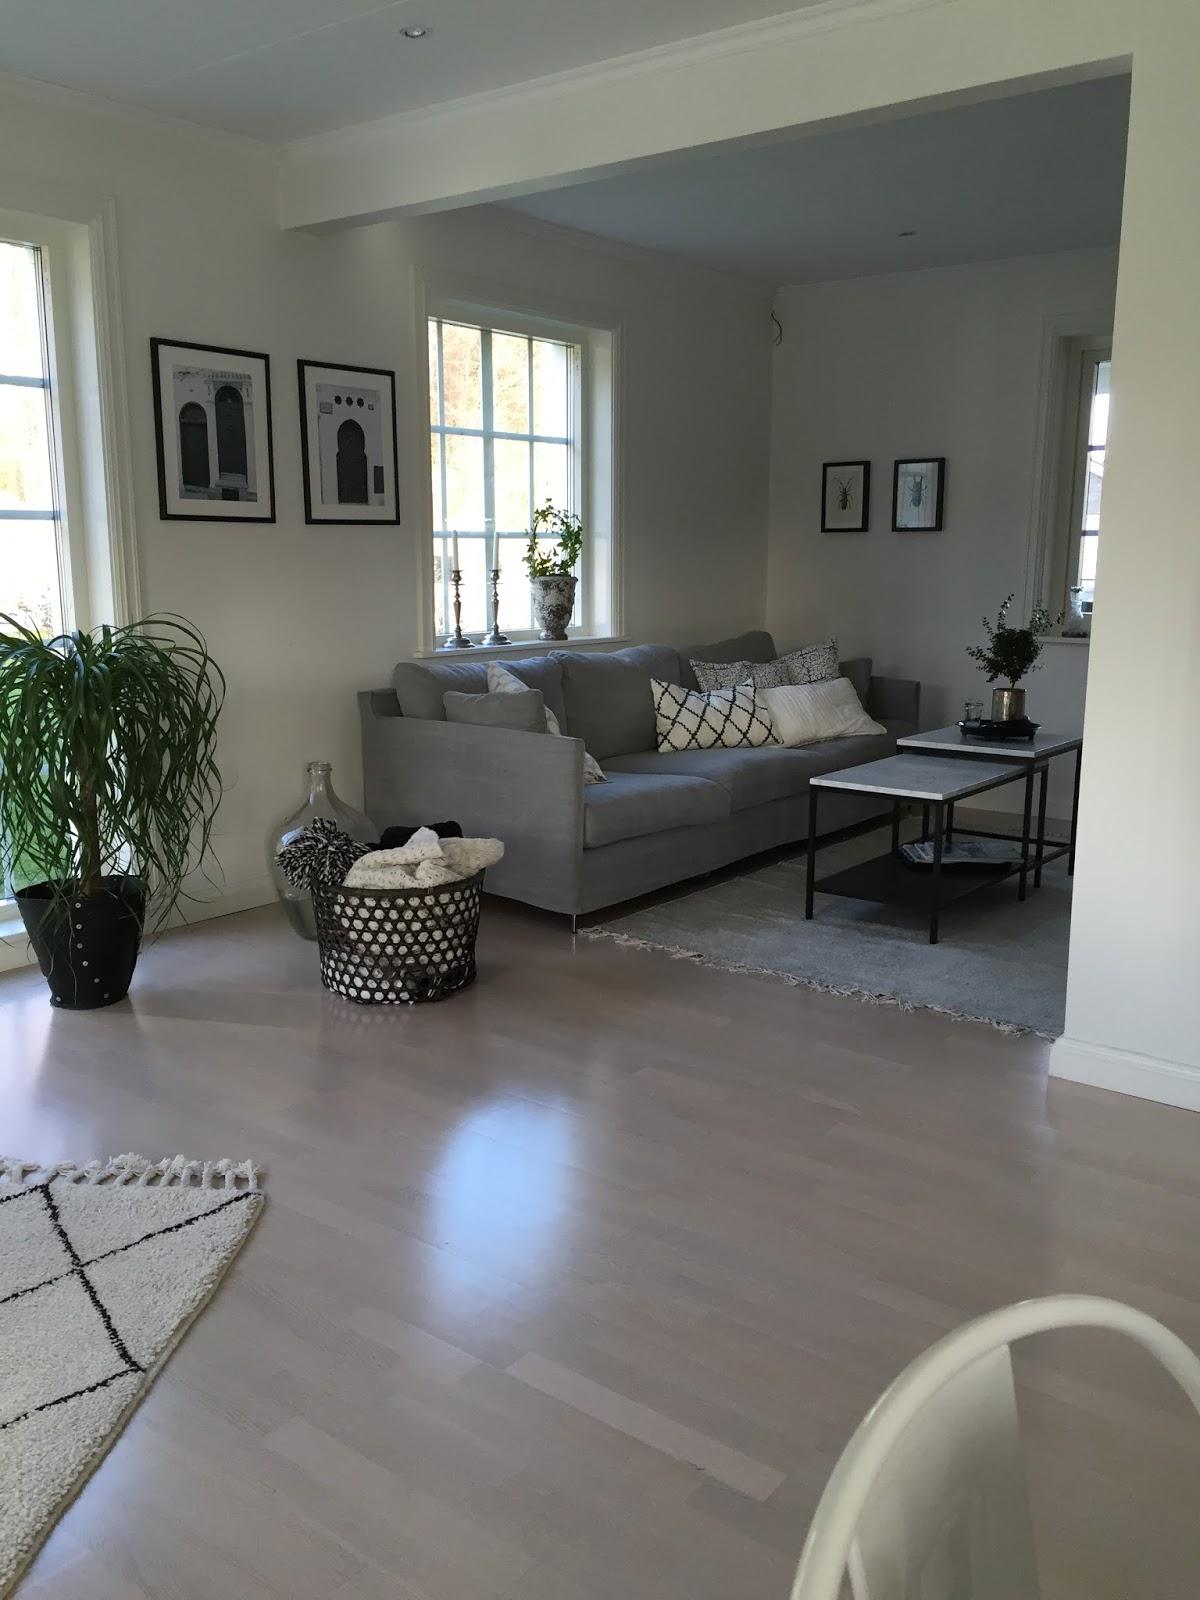 Casa de magnolia: ikea goes marmor